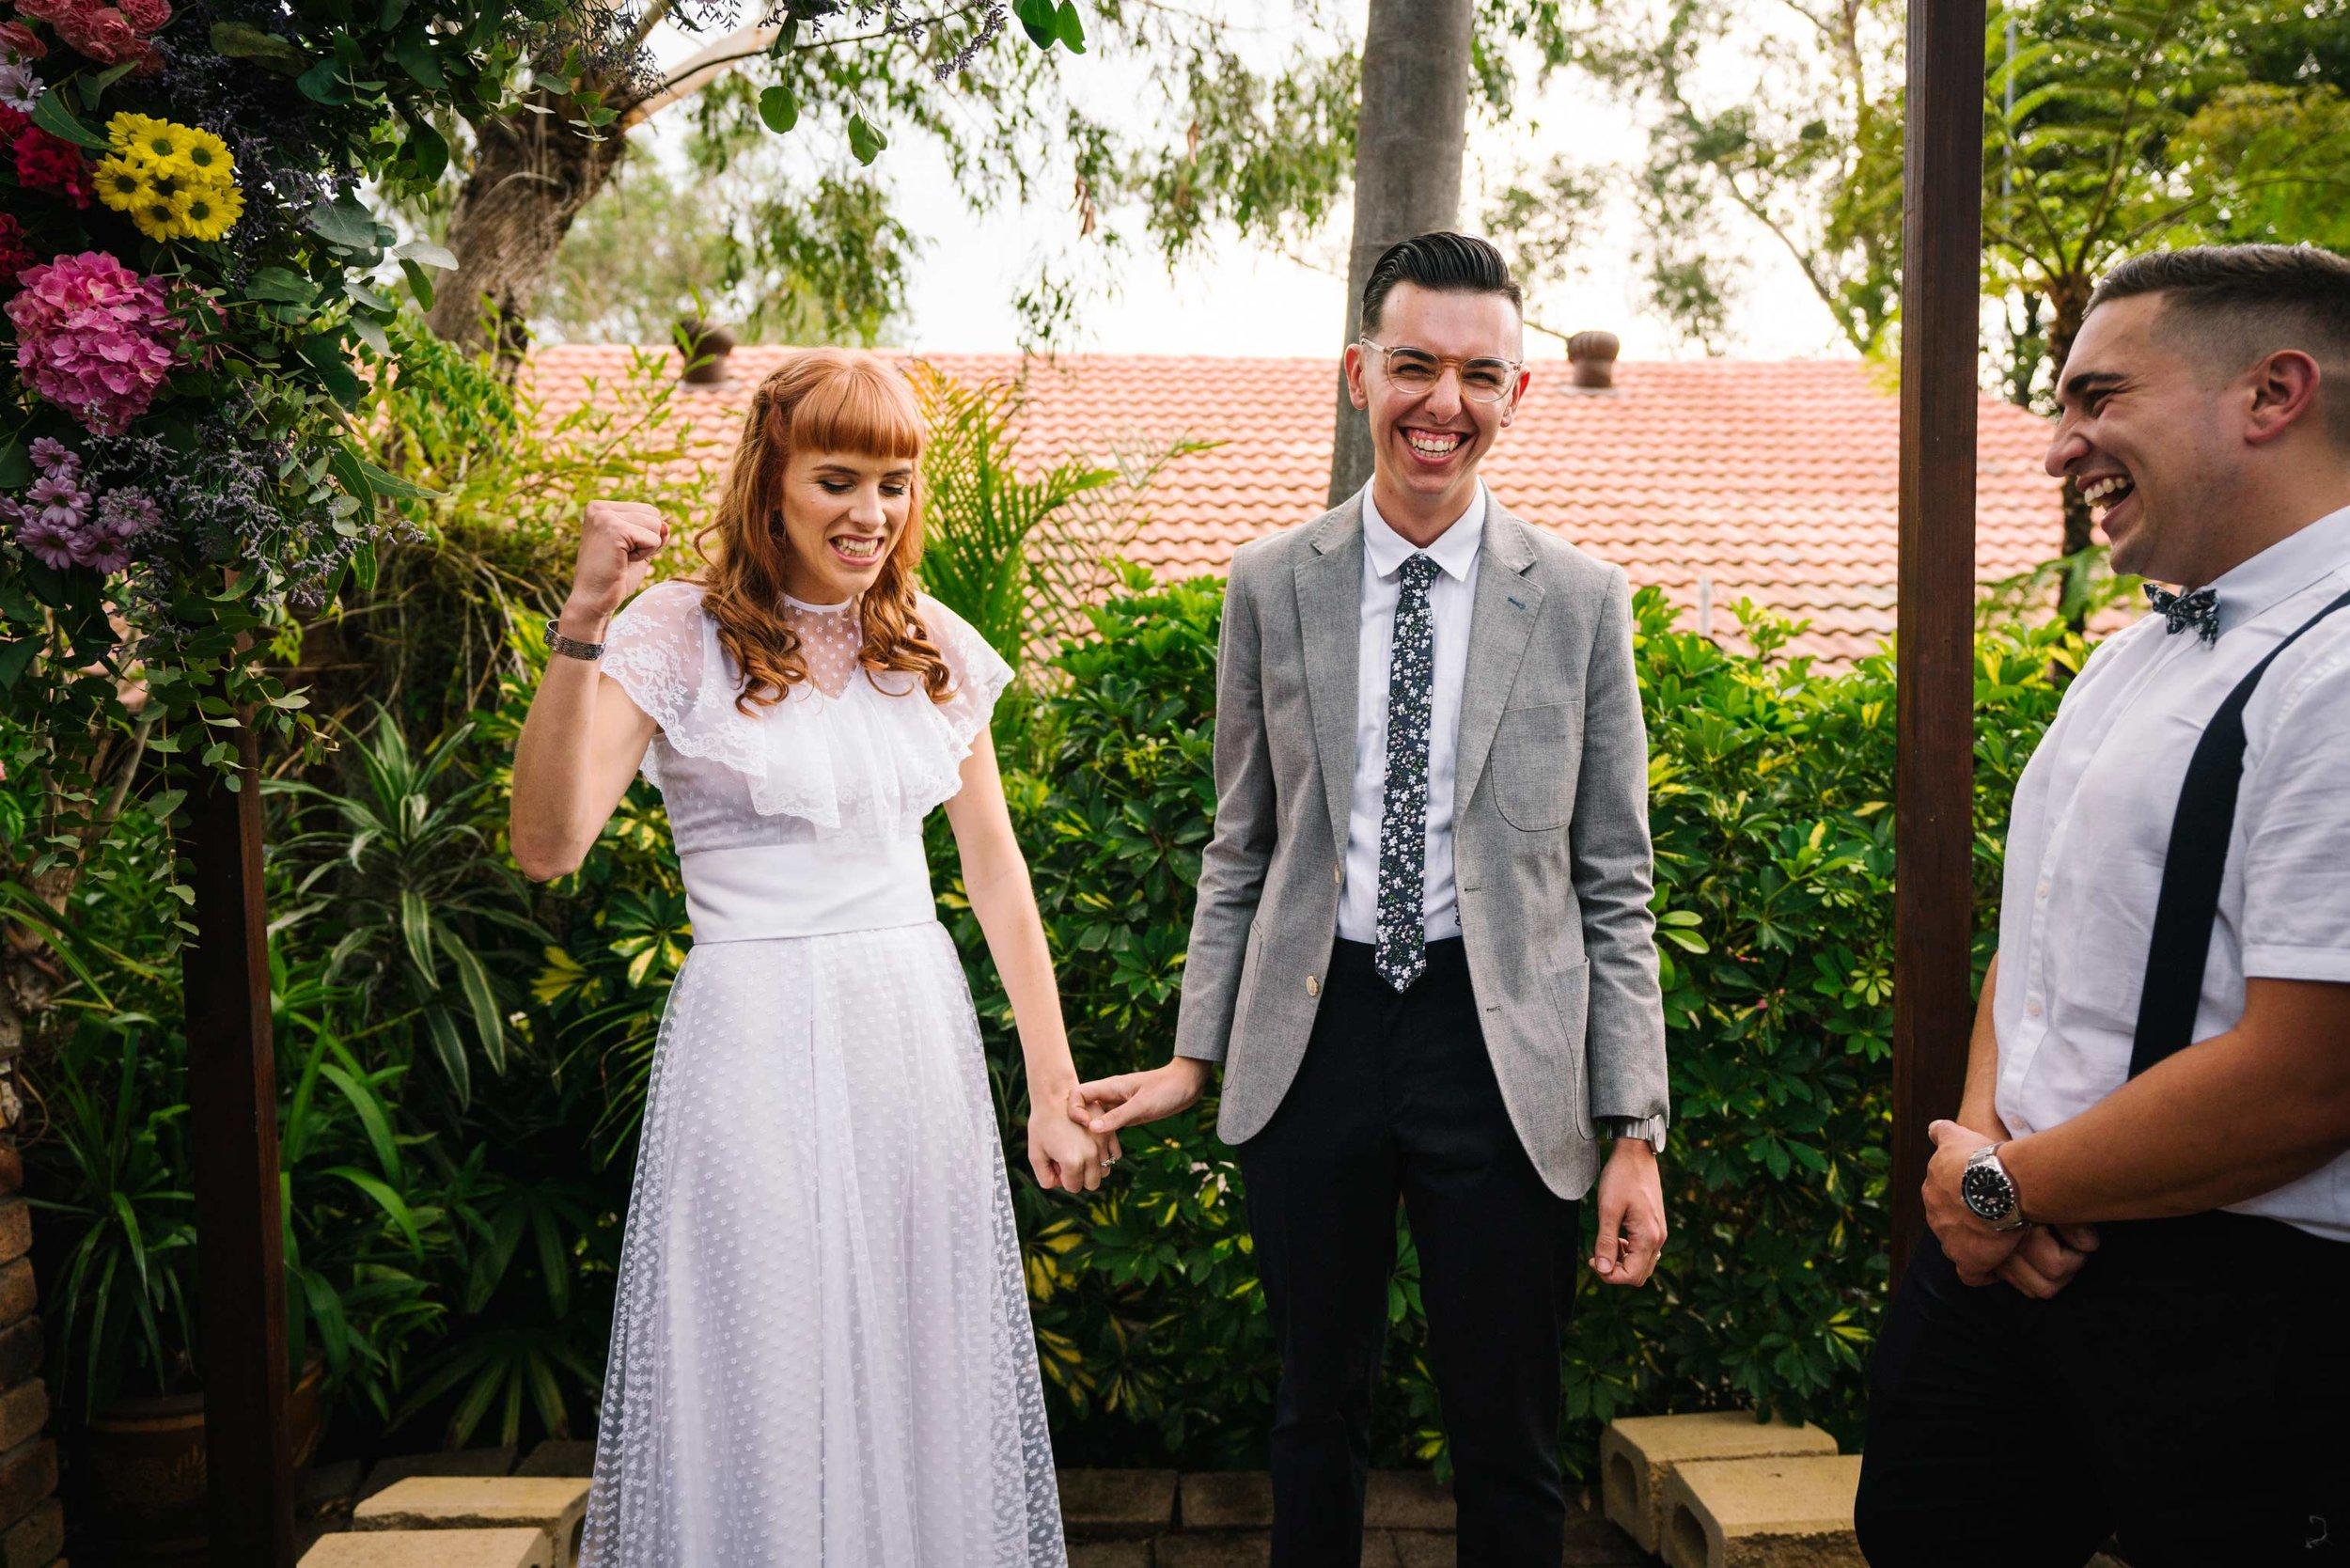 bride and groom celebrate after garden wedding service